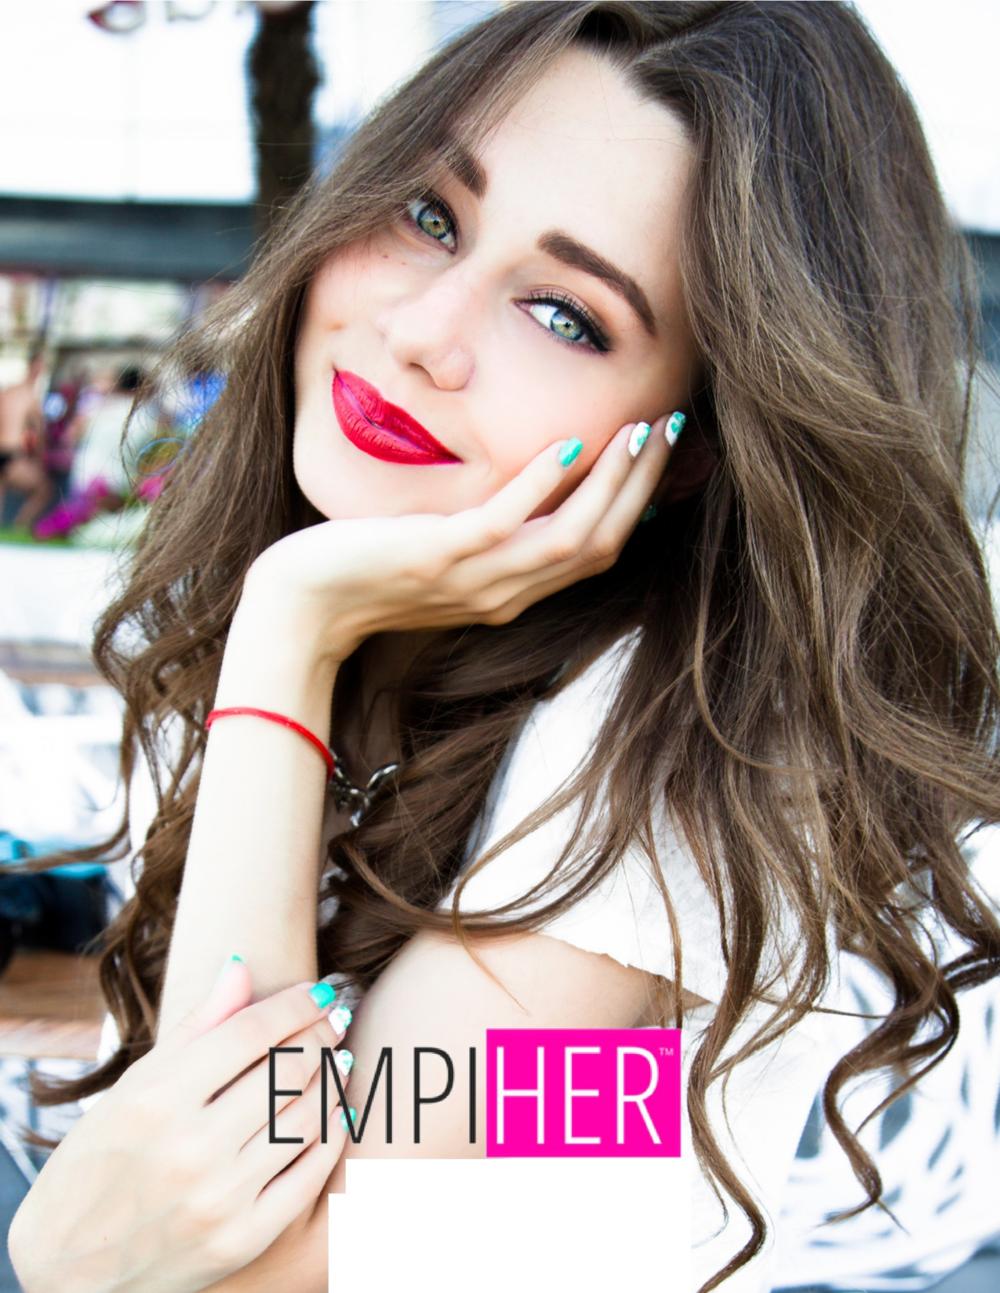 EmpiHER™ Vol 1, Issue 5